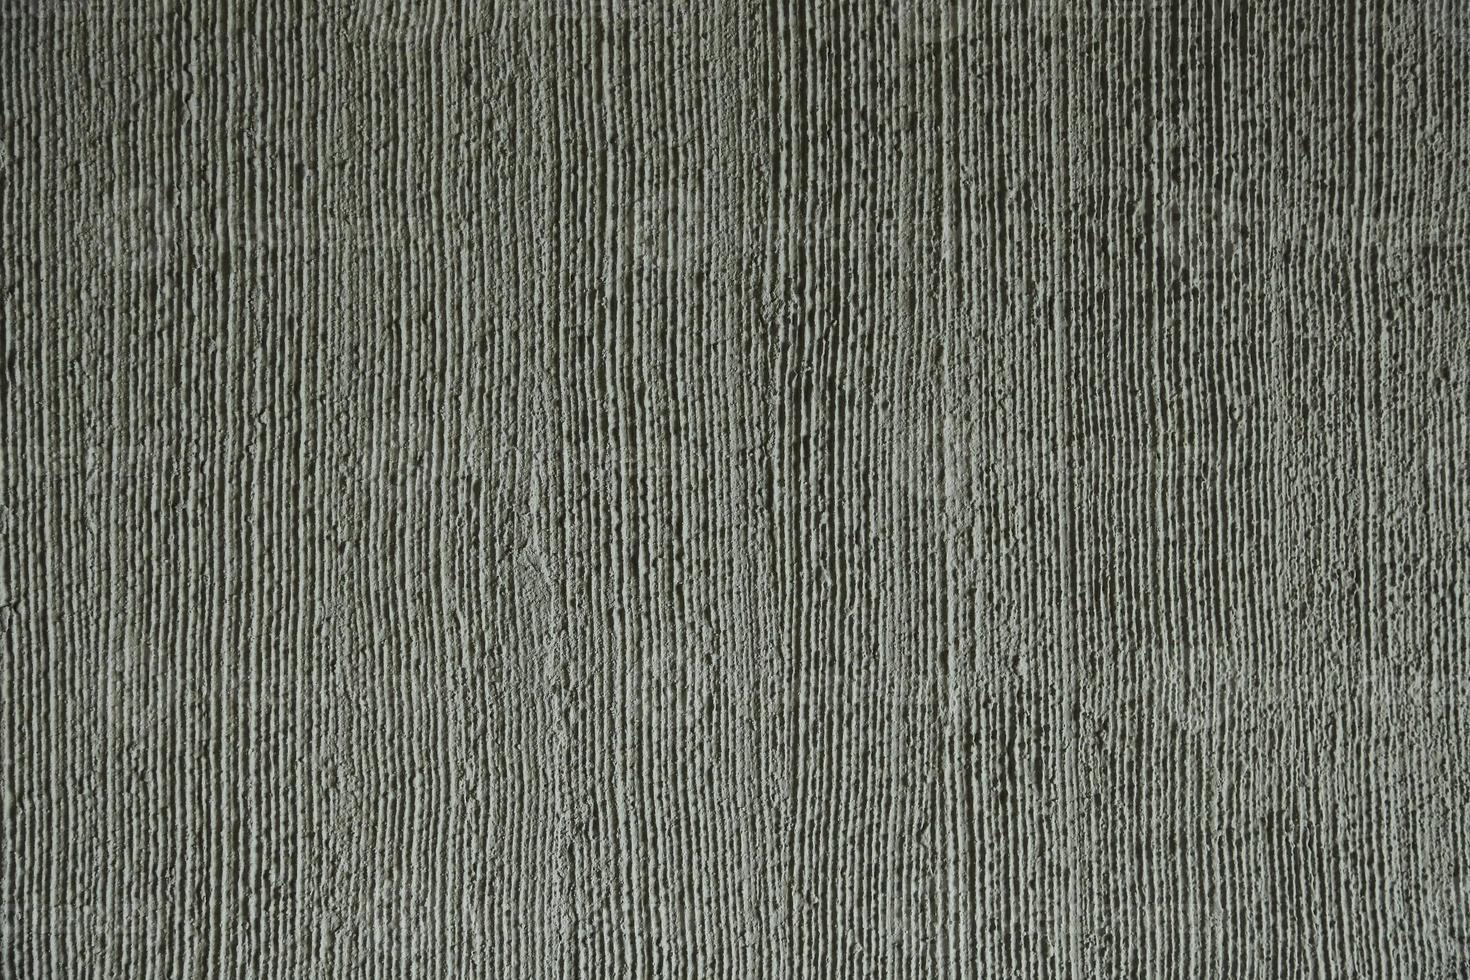 texture di sfondo muro grunge foto